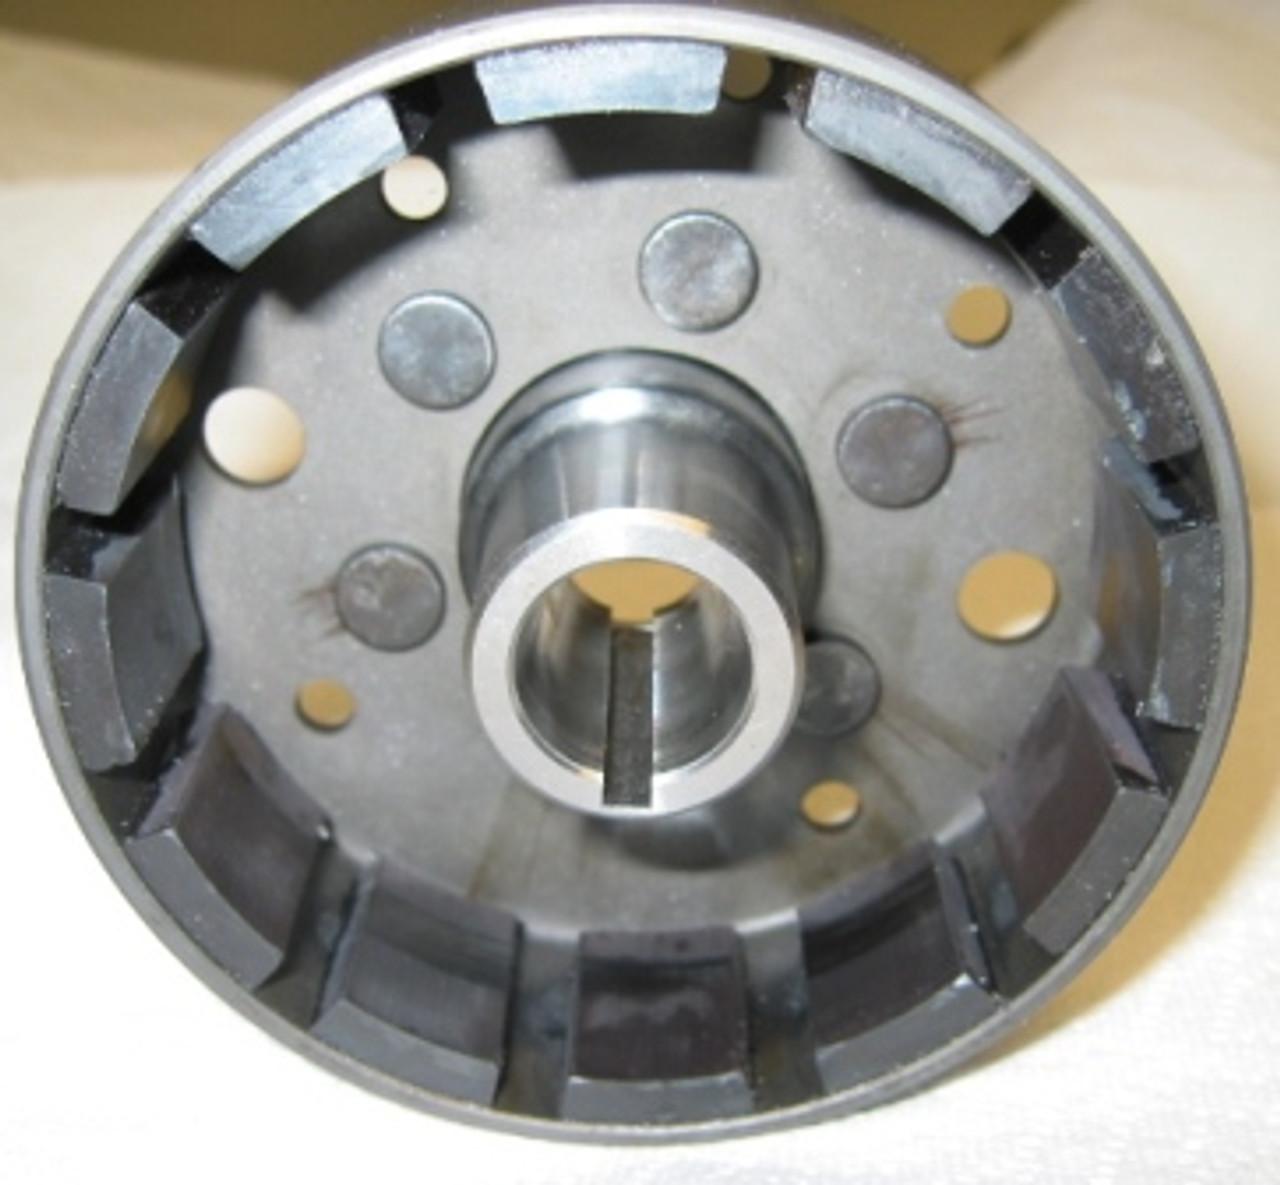 Yamaha RD, R5 CDI Ignition-12v/150W, 71-05-799-00